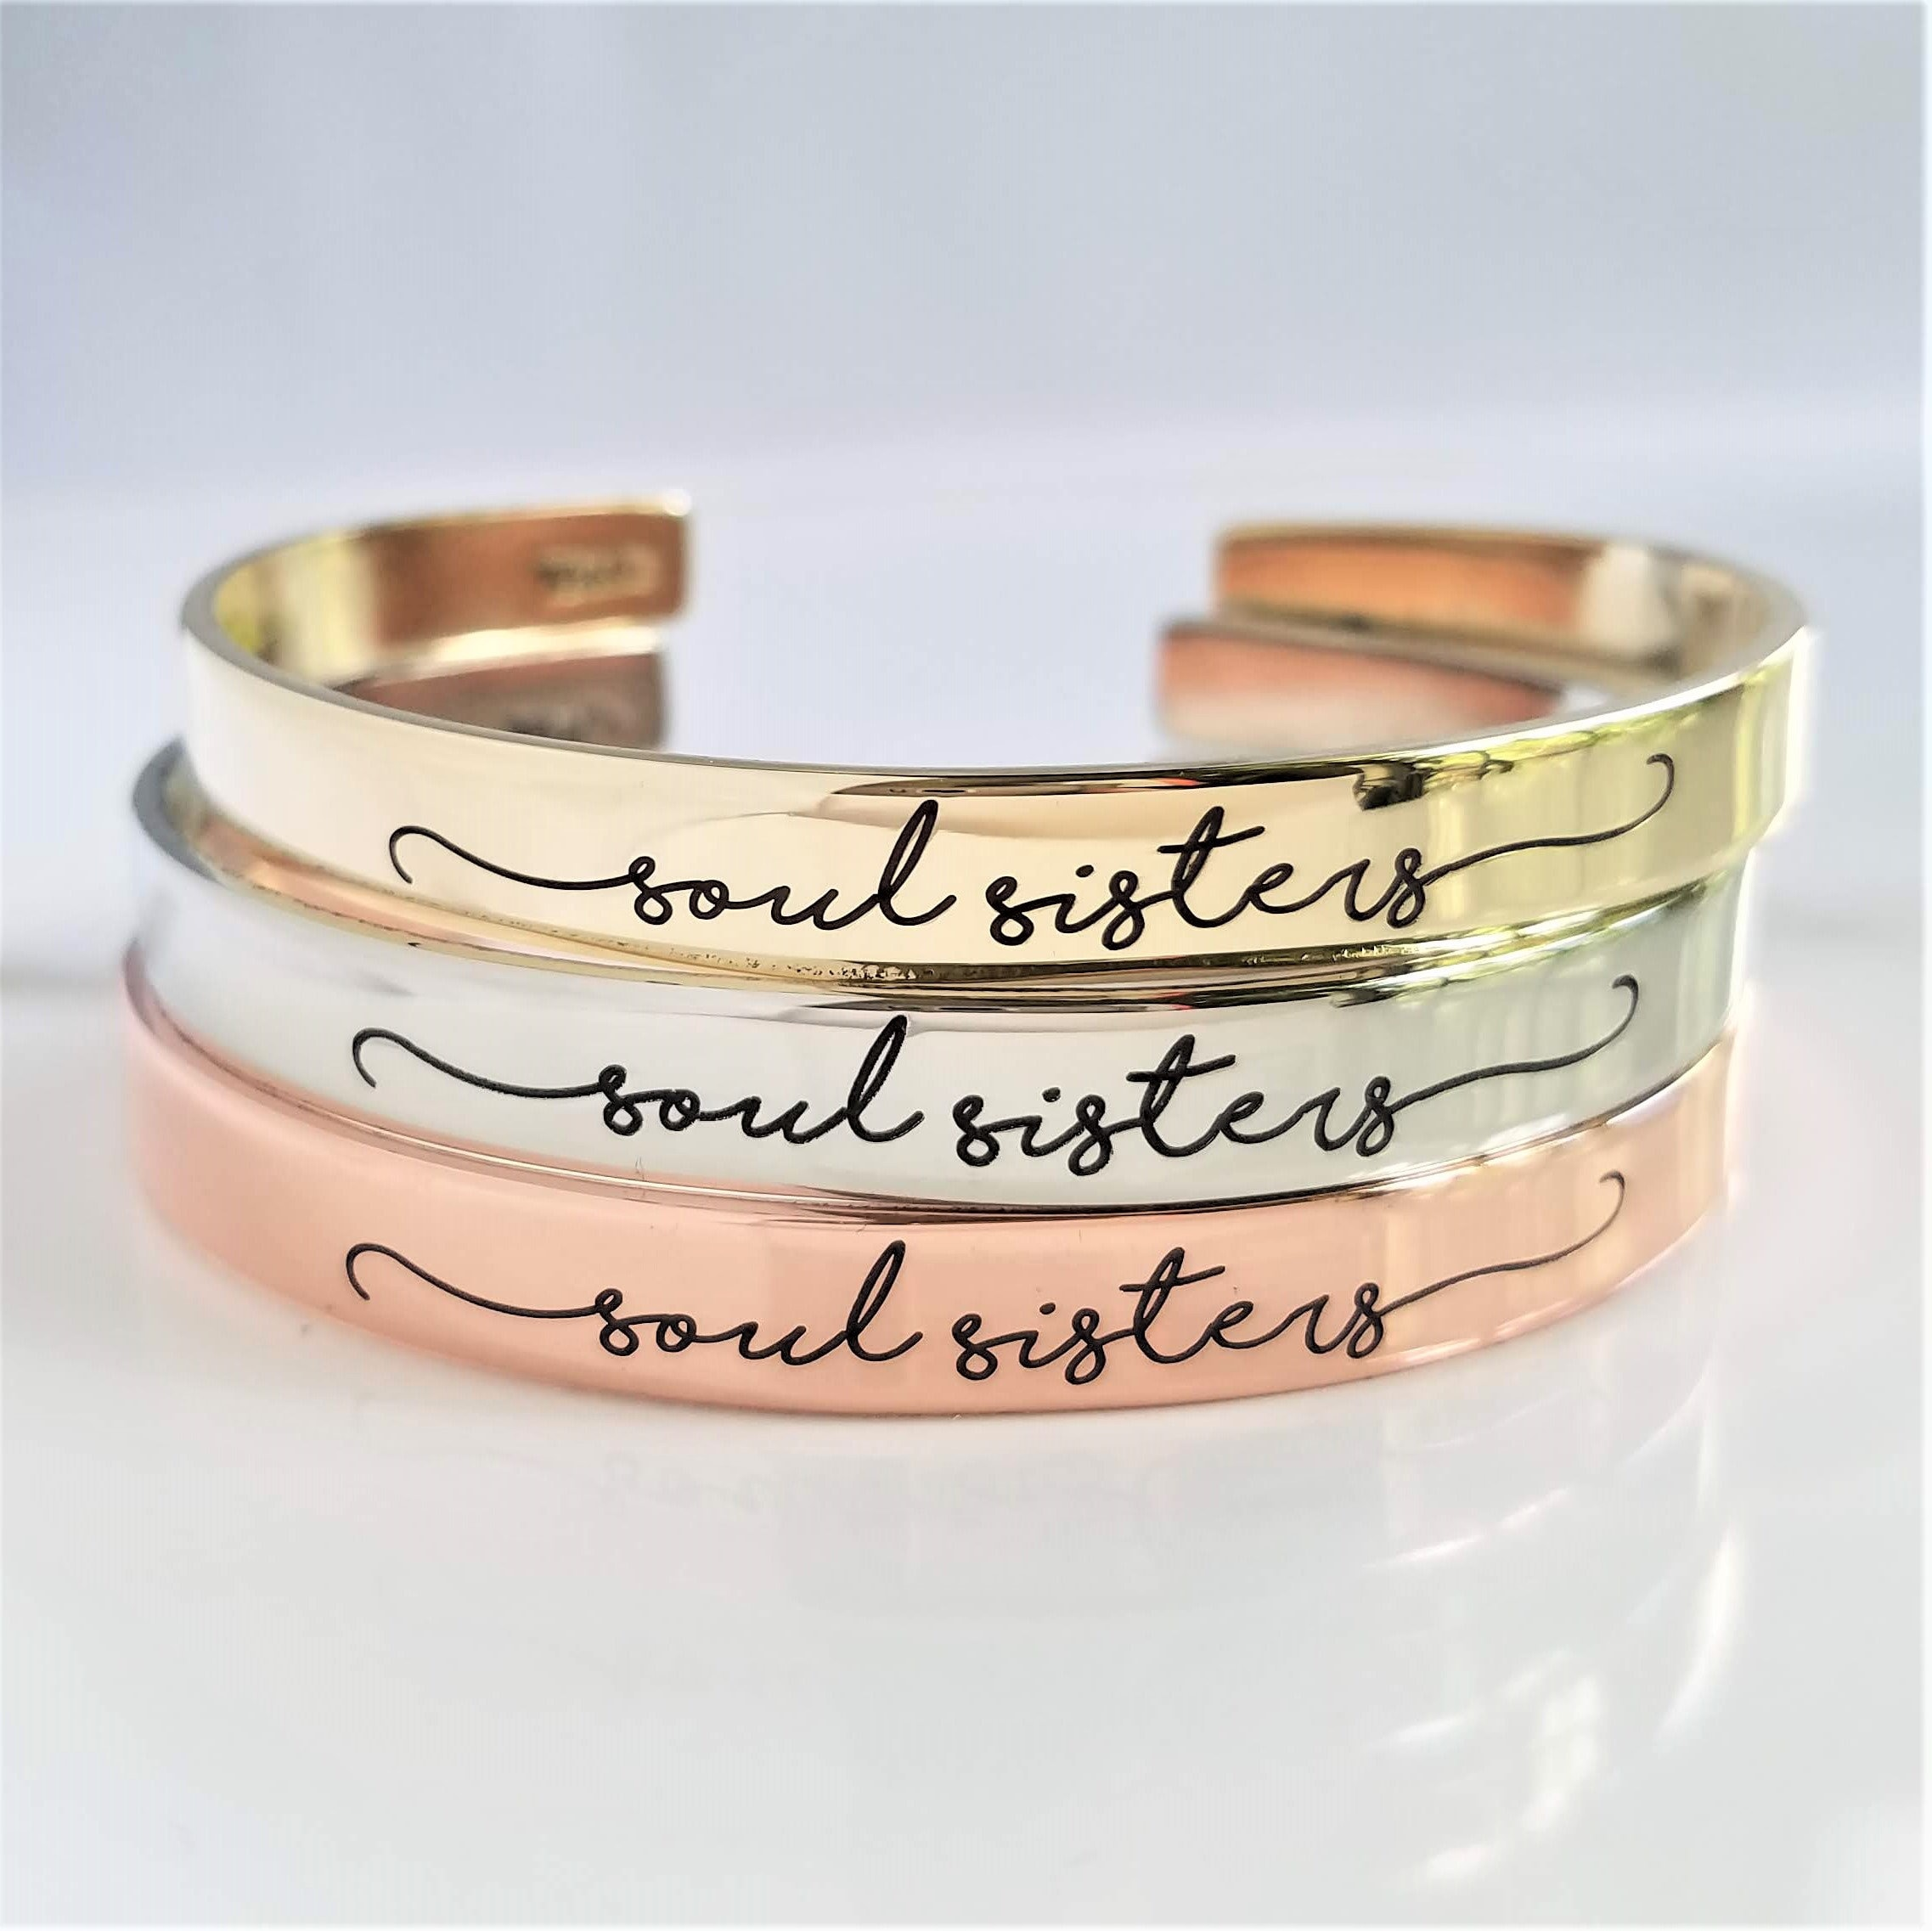 friend jewelry BUY 2 Personalized Bracelets personalized gift friend gift personalized jewelry Friends are sisters brass cuff